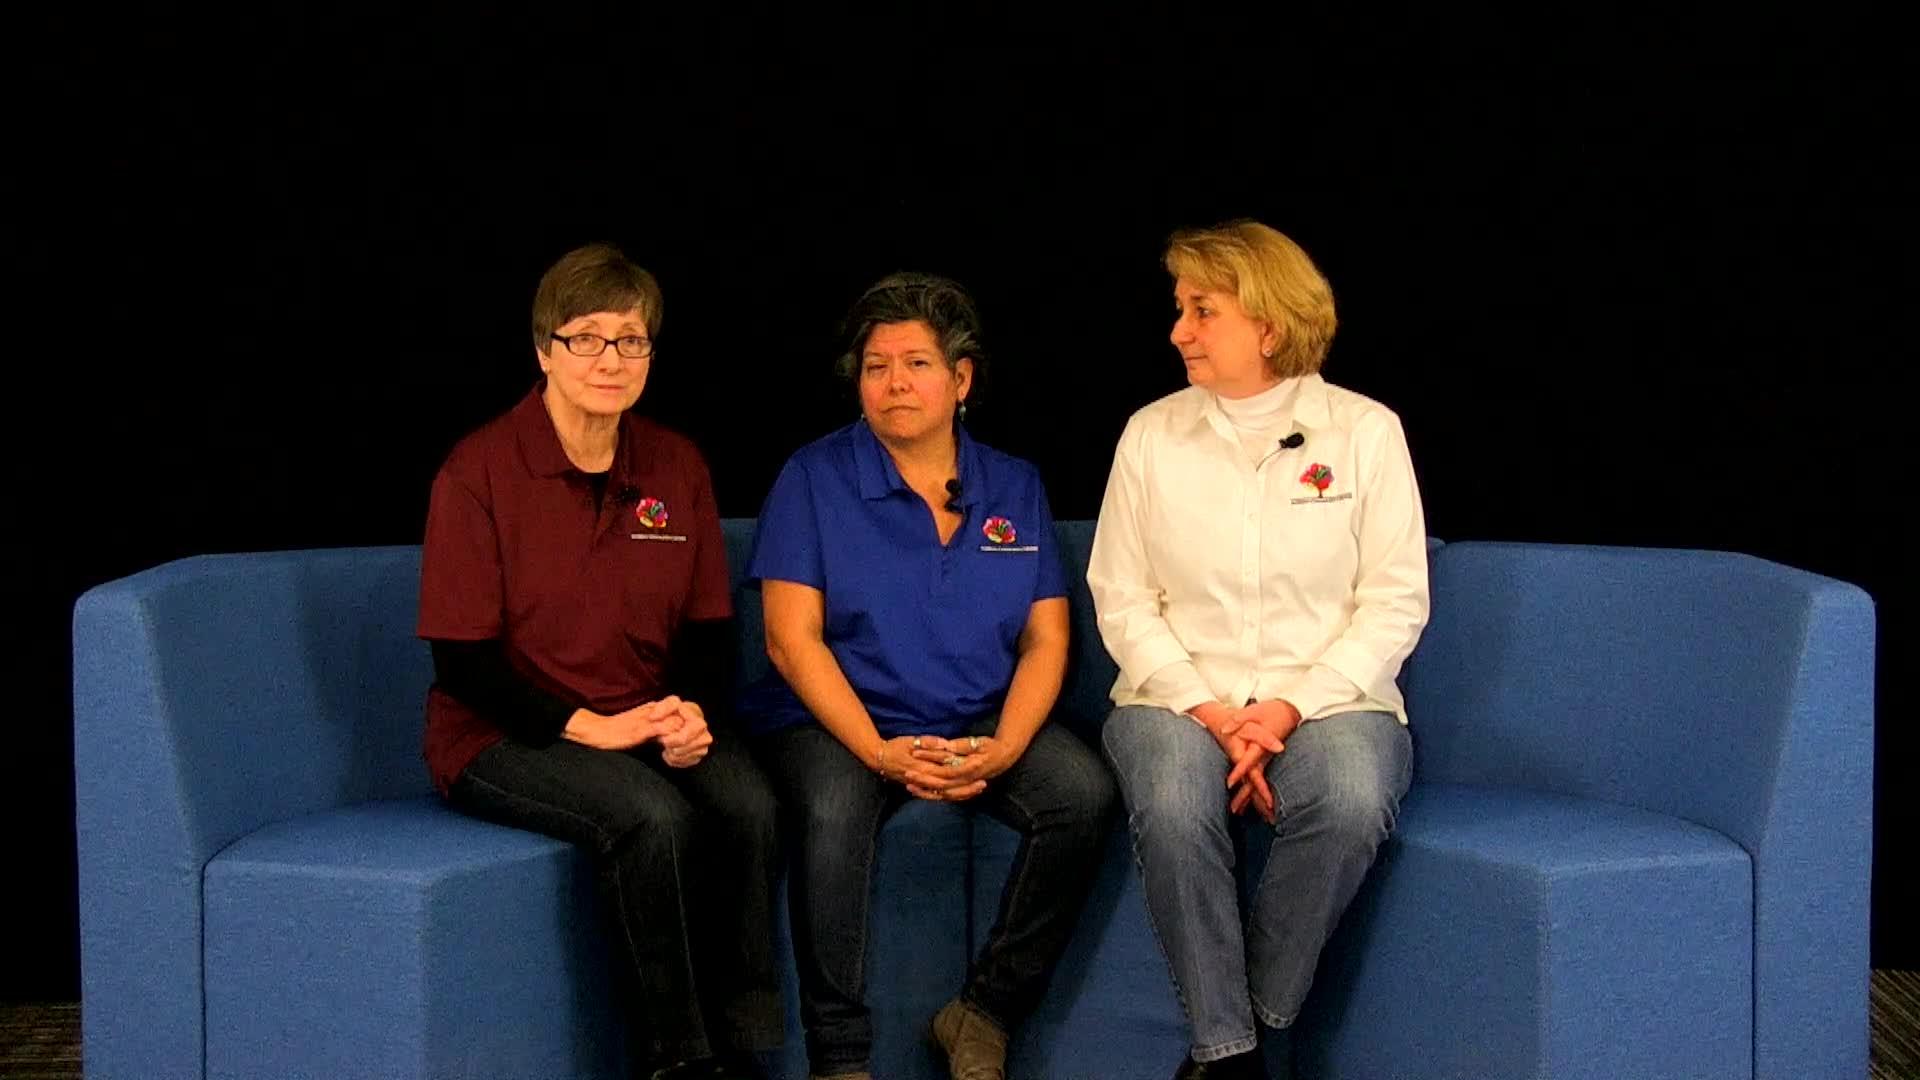 SHMD 2020 - Meet the Recipients - Moreau Community Center